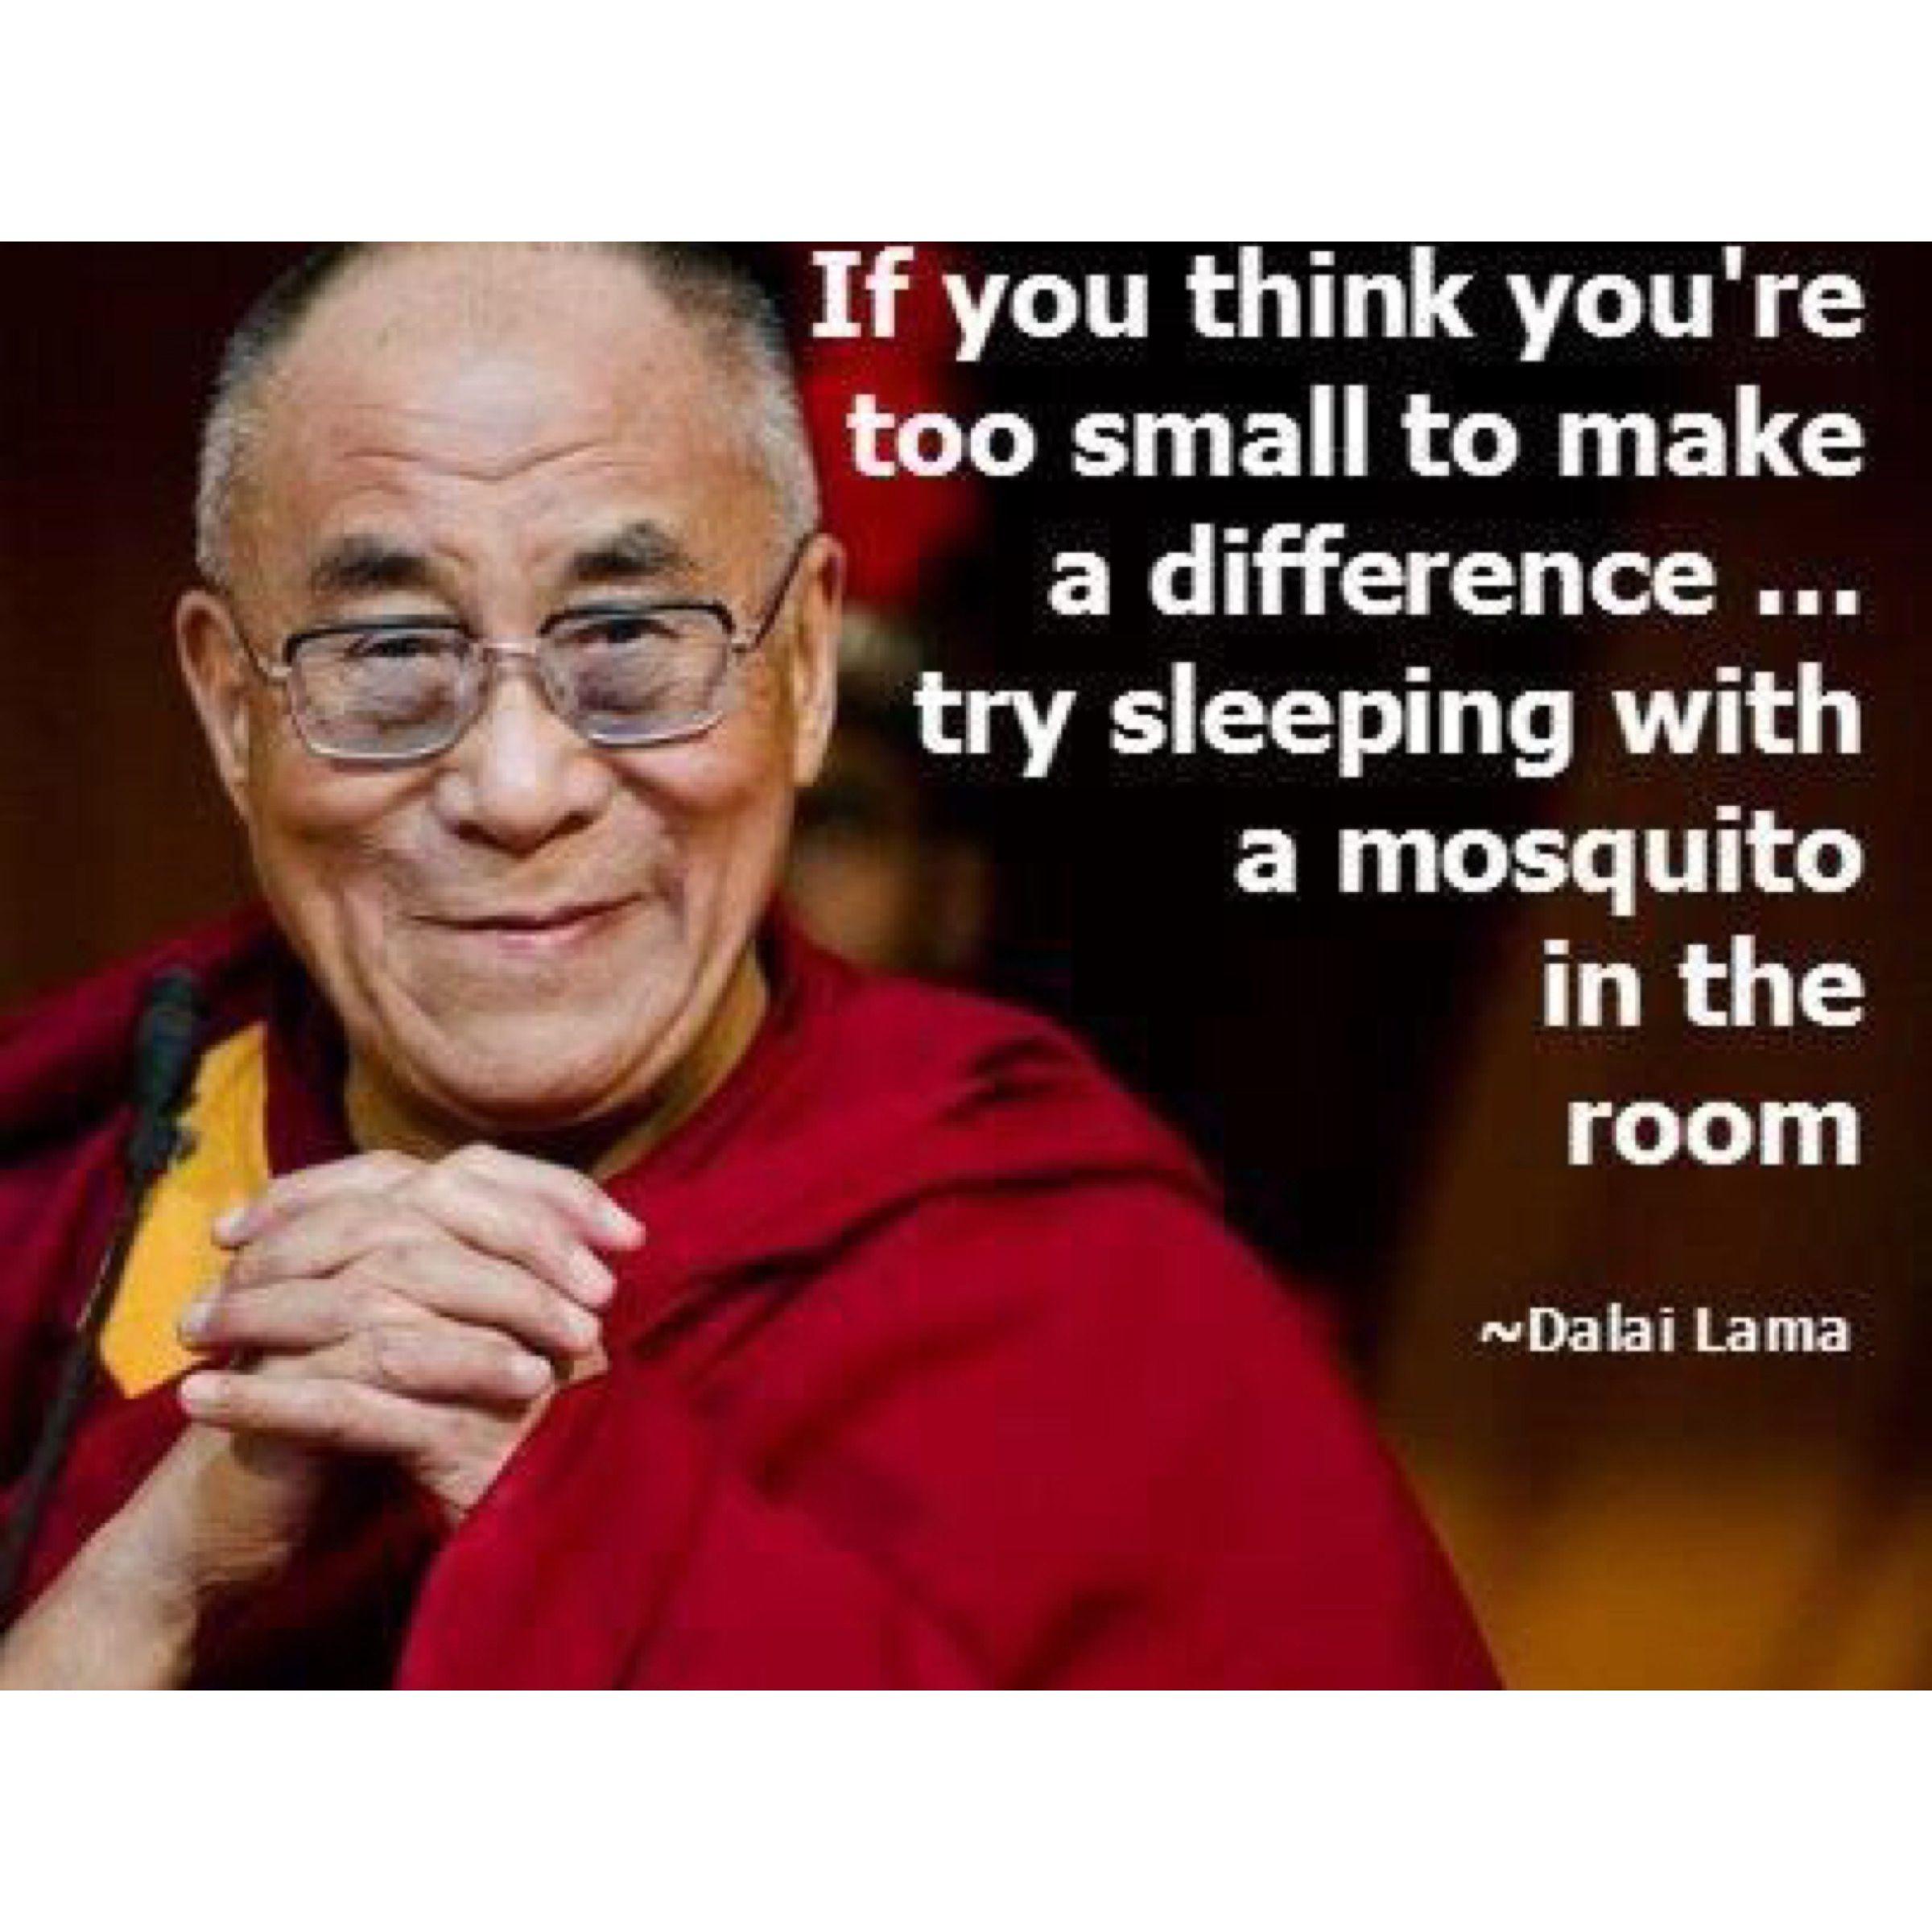 Dalai Lama Quotes When You Talk